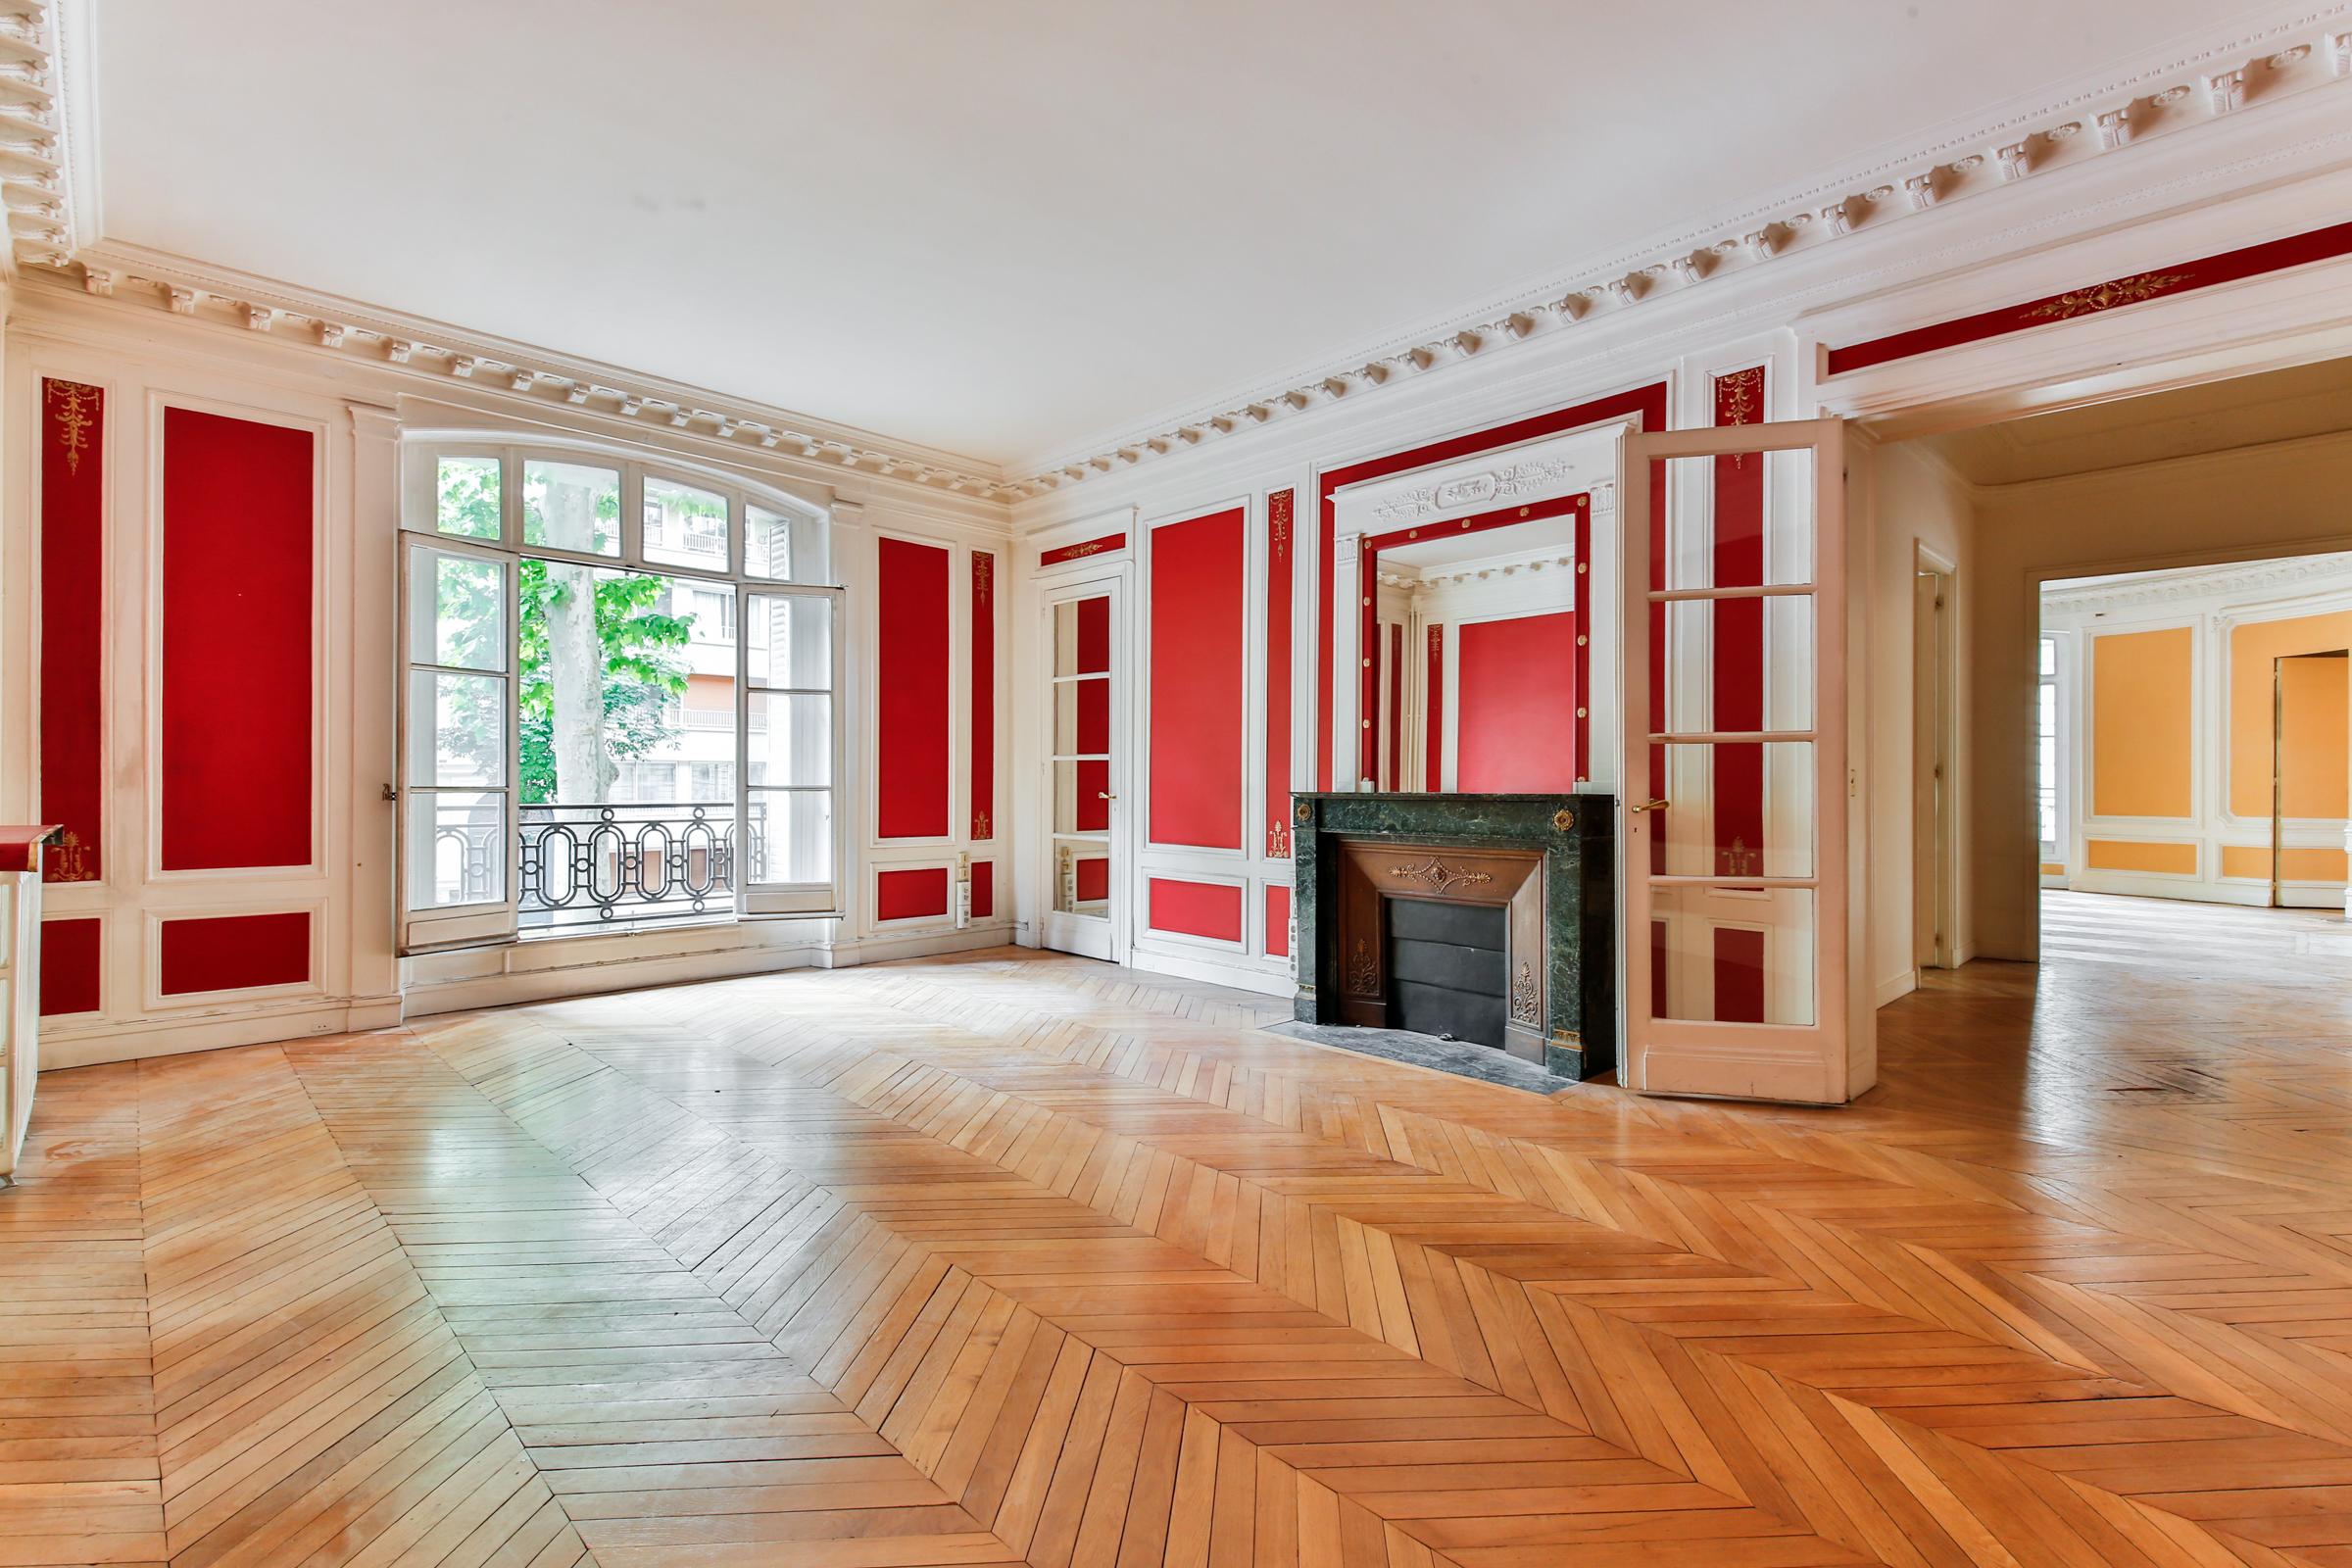 Tek Ailelik Ev için Satış at Apartment - Bd Malesherbes - Lycée Carnot Paris, Paris 75017 Fransa